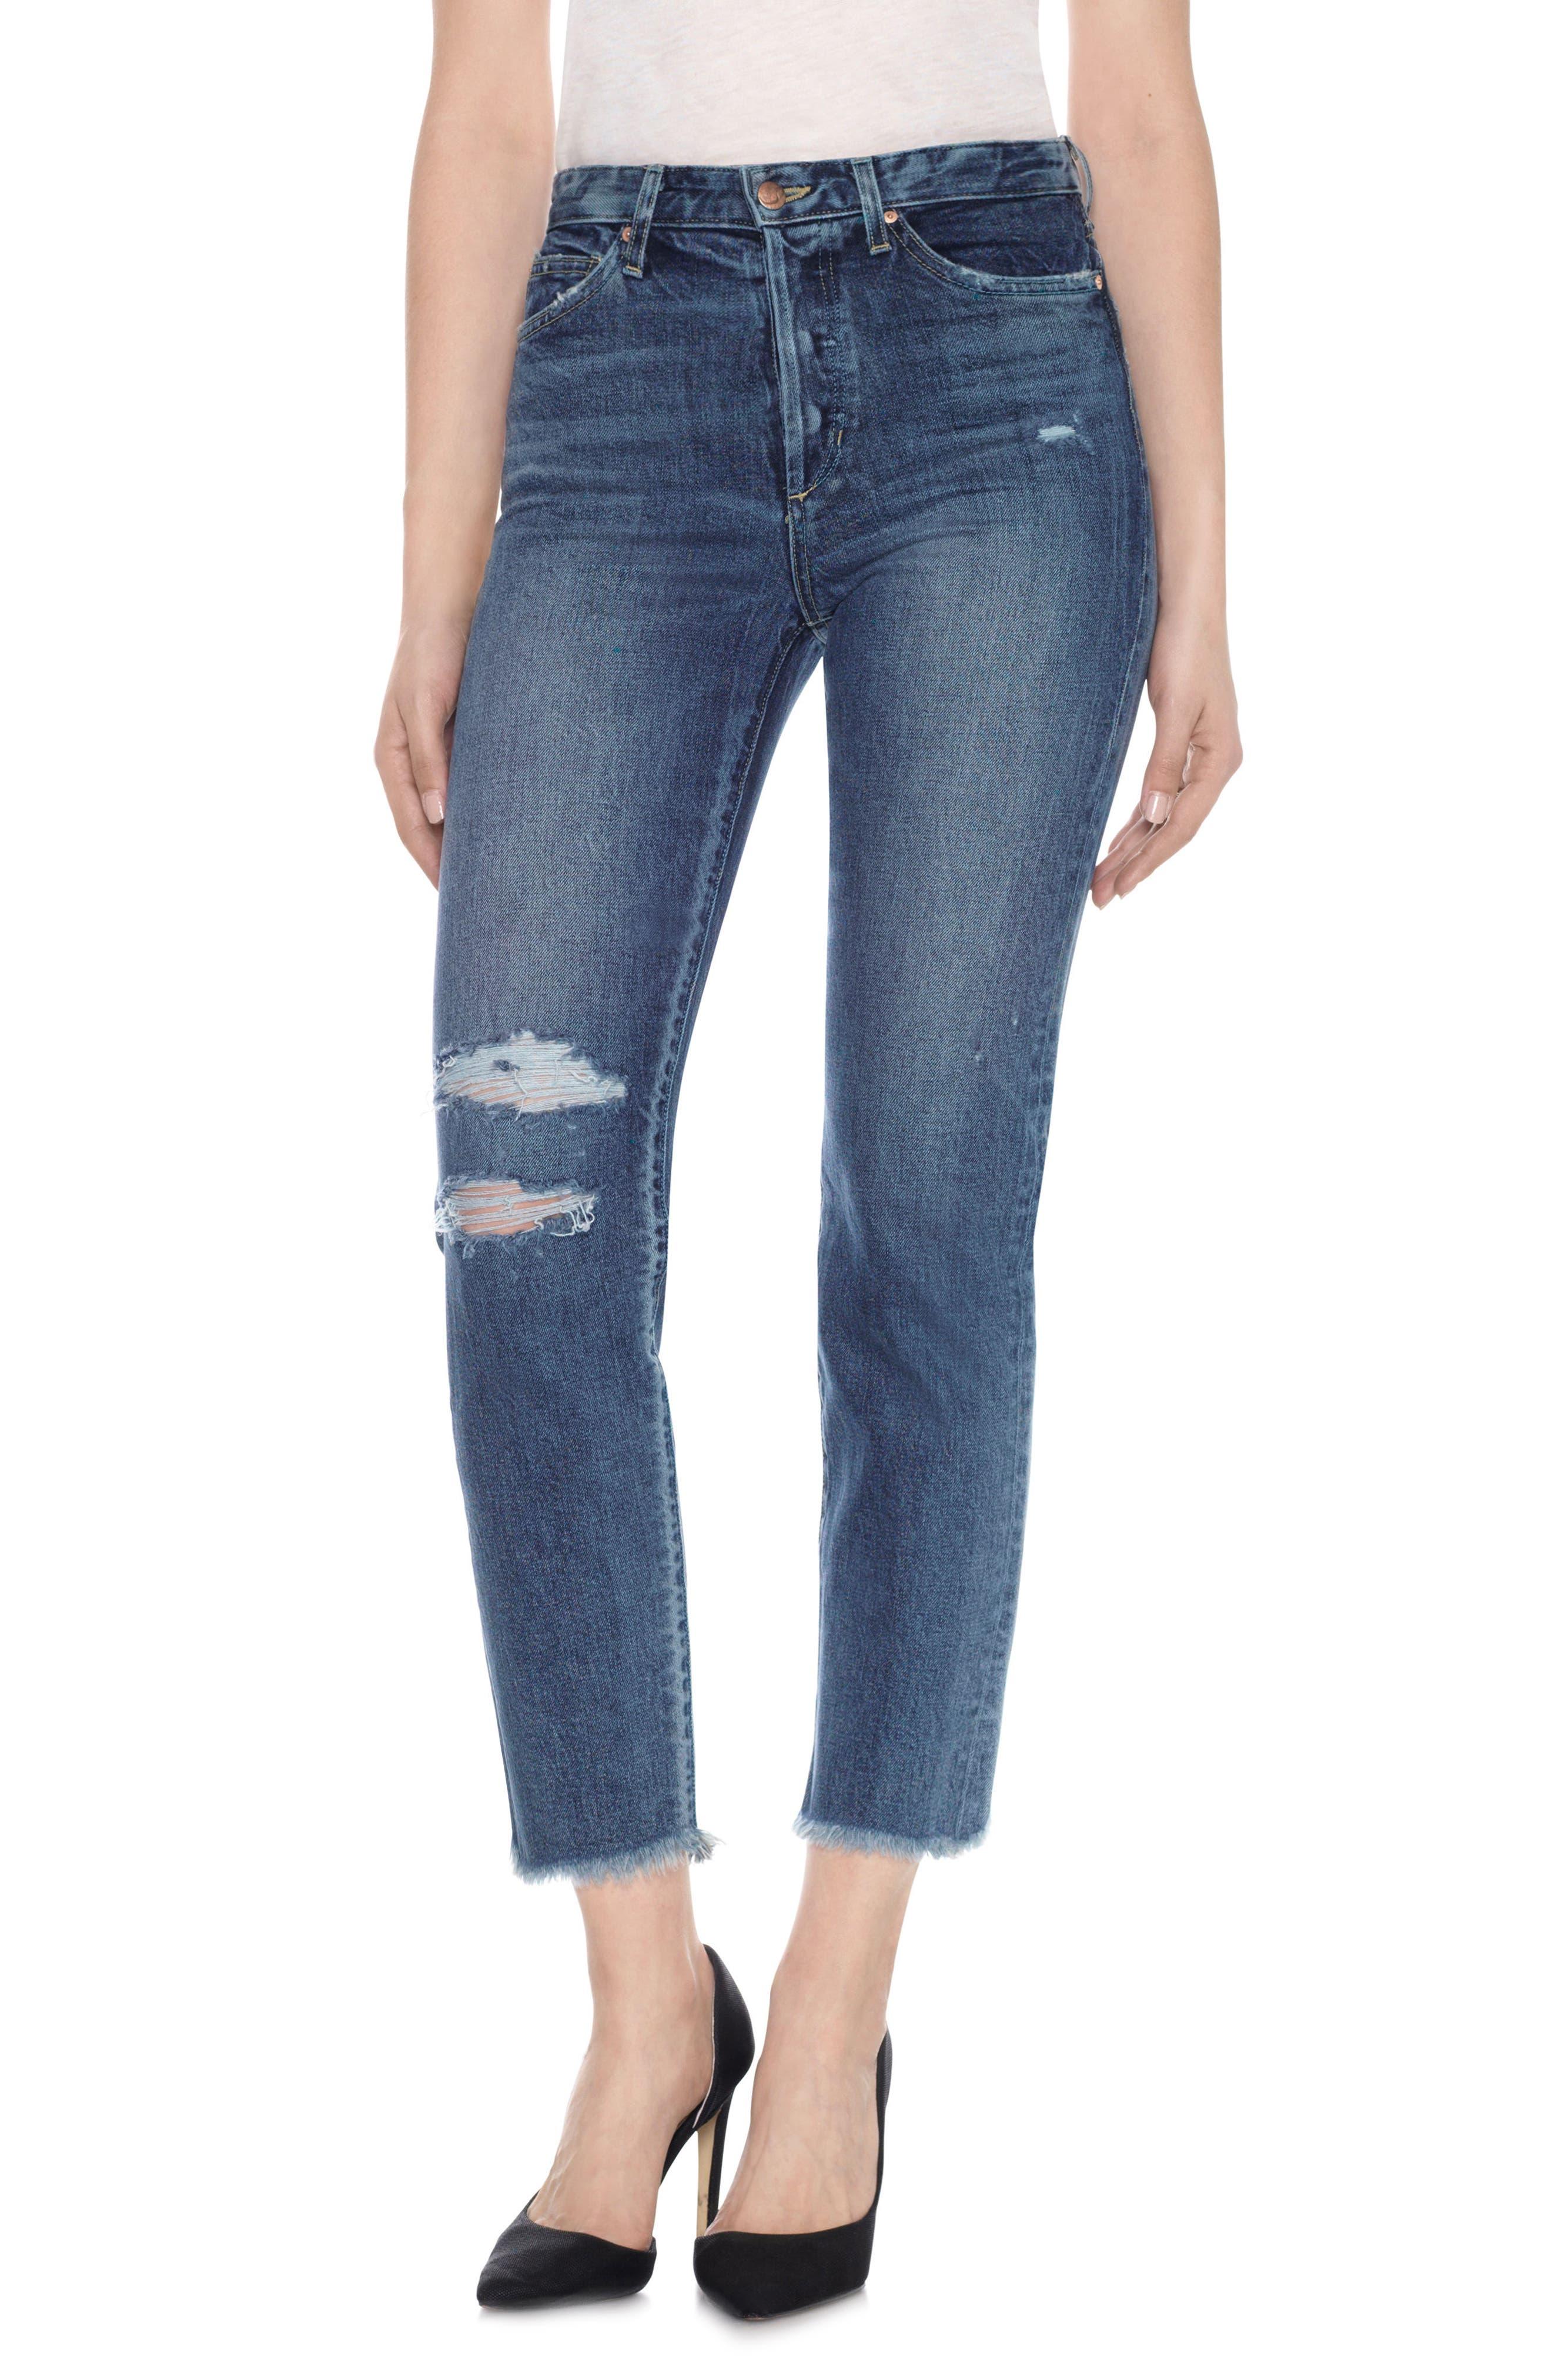 Taylor Hill x Joe's Debbie High Rise Ankle Jeans,                         Main,                         color, Julee